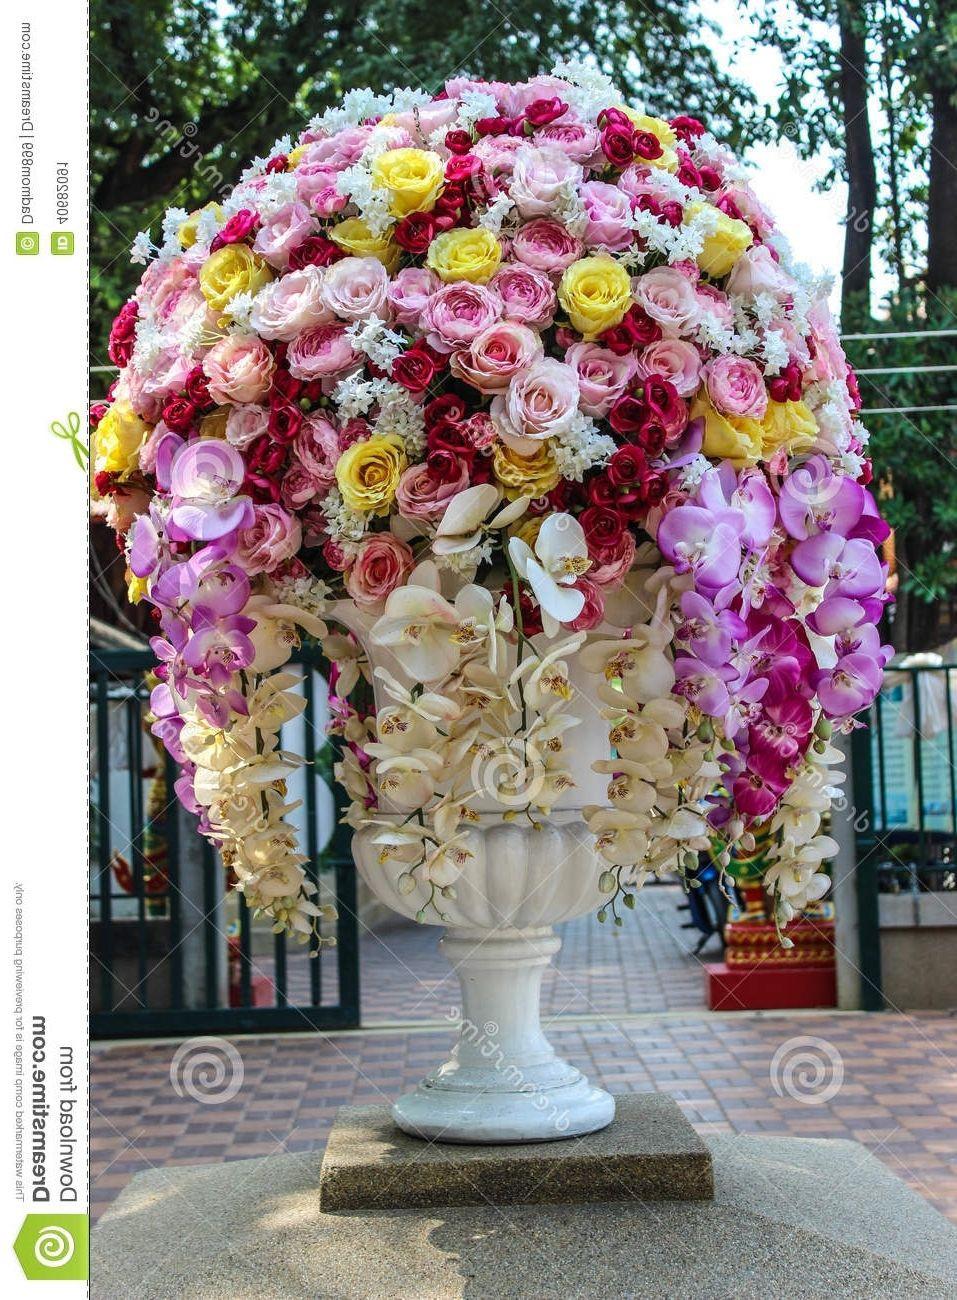 large flower vase of amazing design ideas big flower vase class pinterest flowers images with amazing design ideas big flower vase class pinterest flowers images making decoration ebay